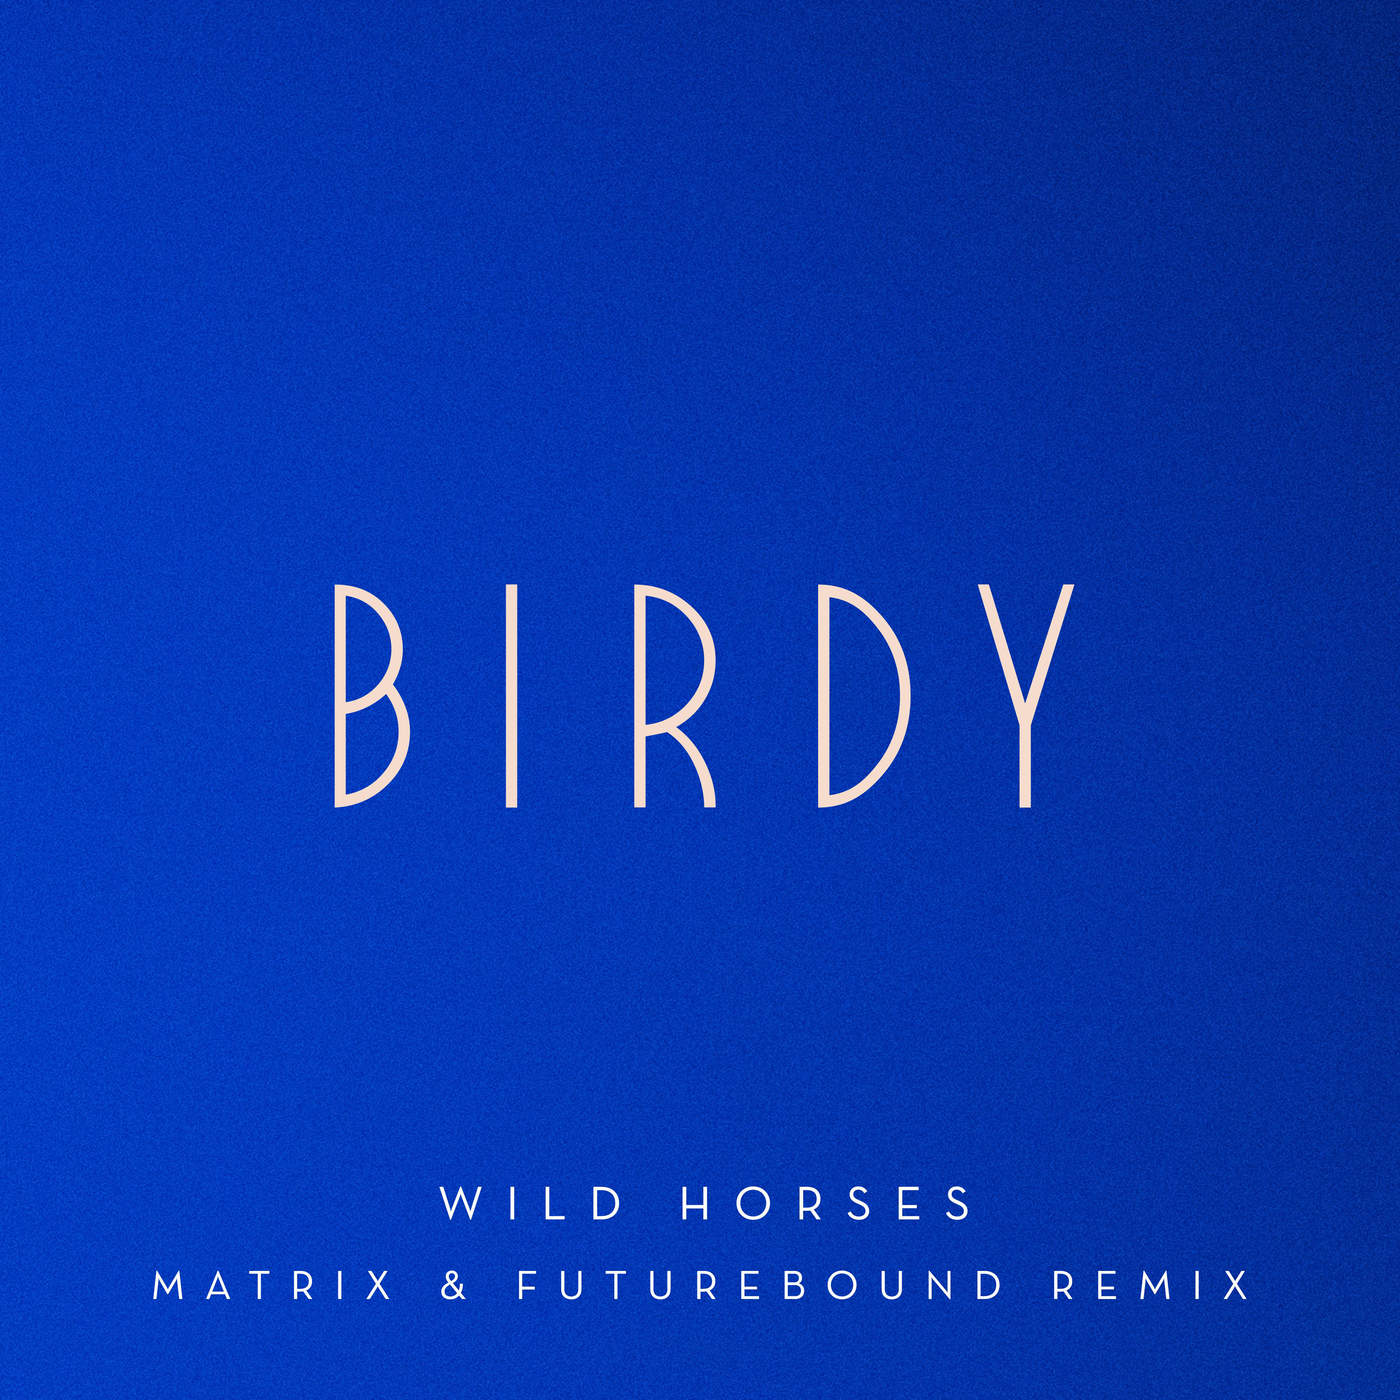 Birdy - Wild Horses (Matrix & Futurebound Remix) - Single Cover